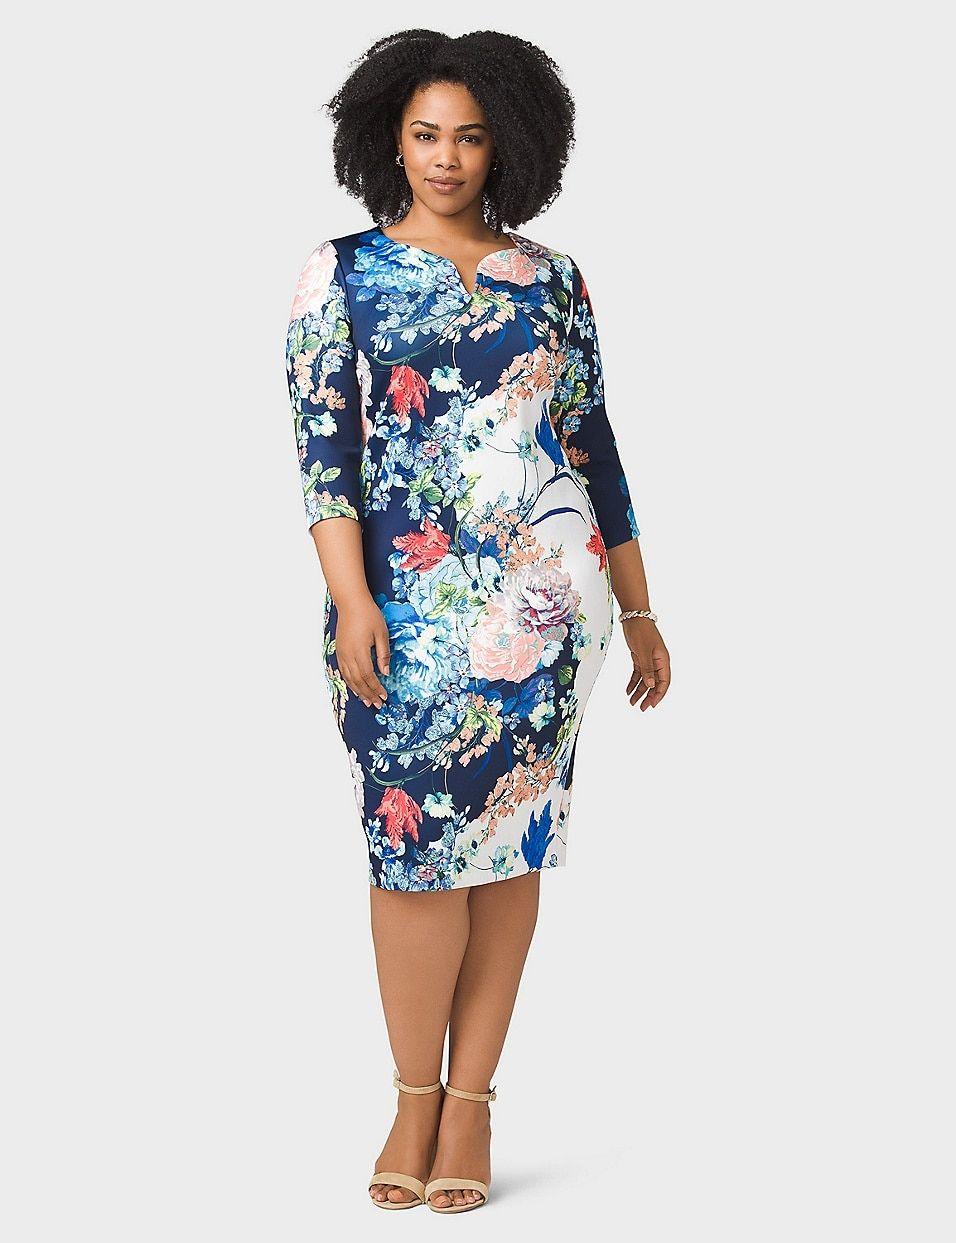 dress barn plus size maxi dresses - Tompo.bietthunghiduong.co